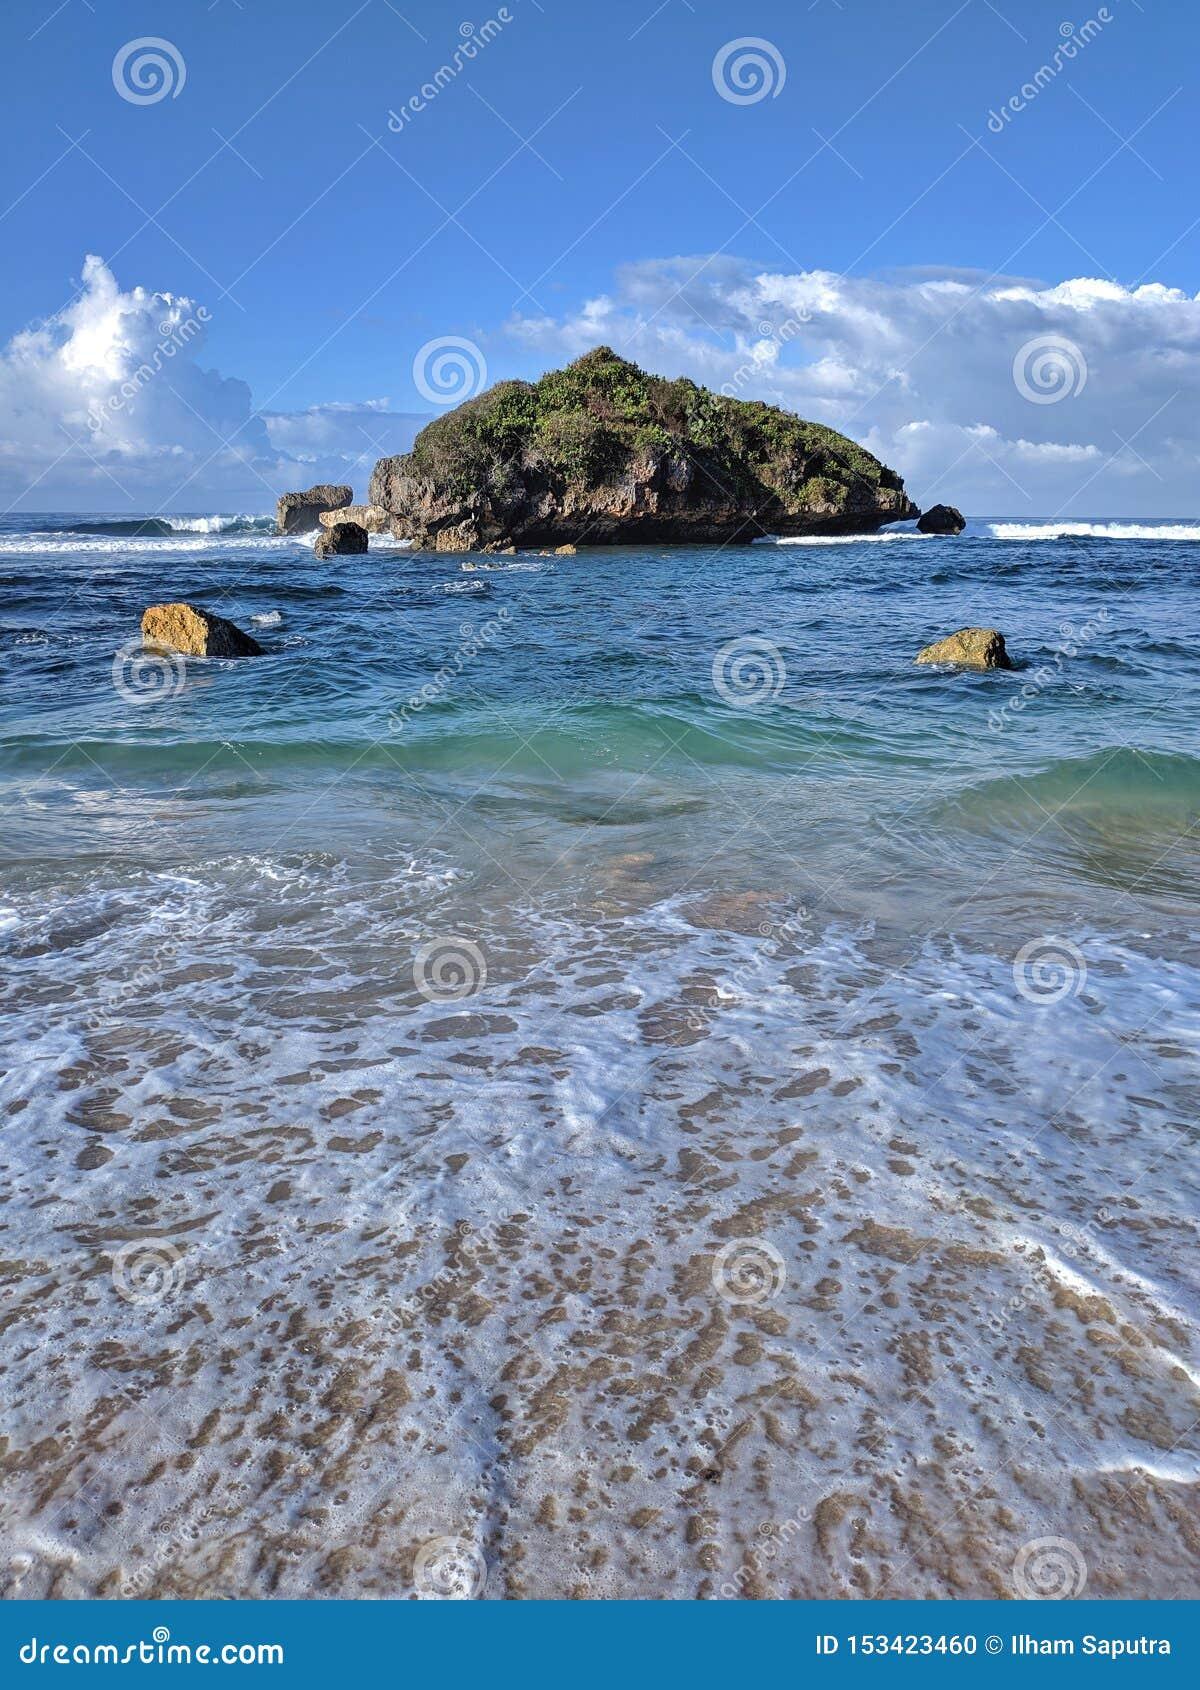 Solig dag på stranden, härlig tropisk strand i Yogyakarta, Indonesien